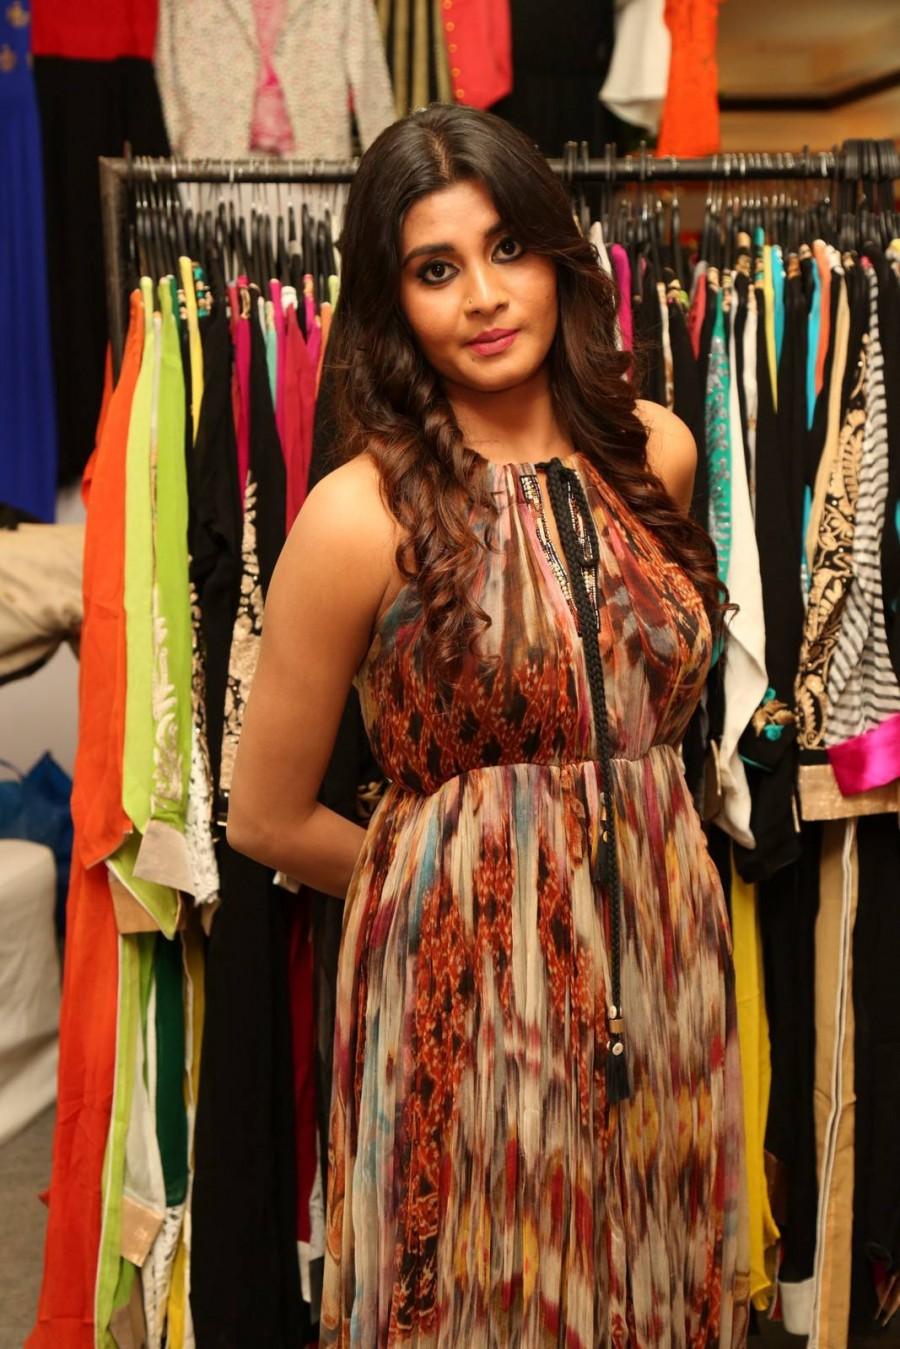 Harini At Fashion Unlimited Expo Launch,Harini,actress Harini,Harini pics,Harini images,Harini photos,Harini stills,south indian actress,actress hot pics,hot Harini,Harini hot pics,Fashion Unlimited Expo Launch